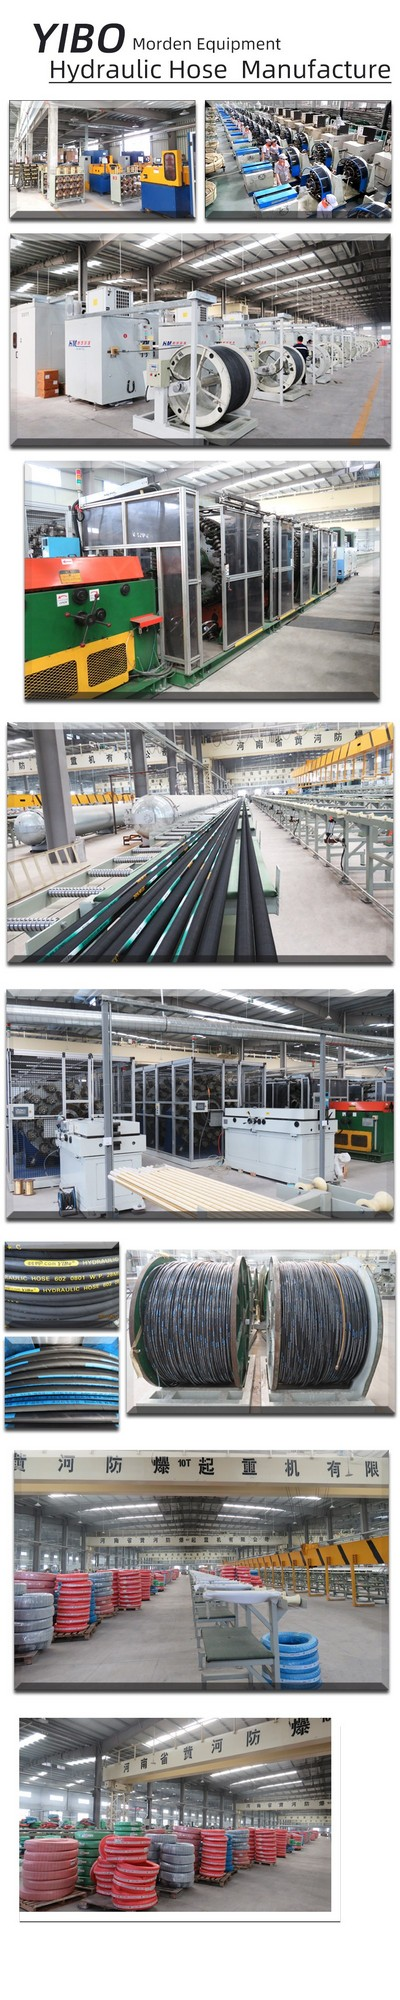 sae 100r13 reinforced hydraulic rubber hose 4